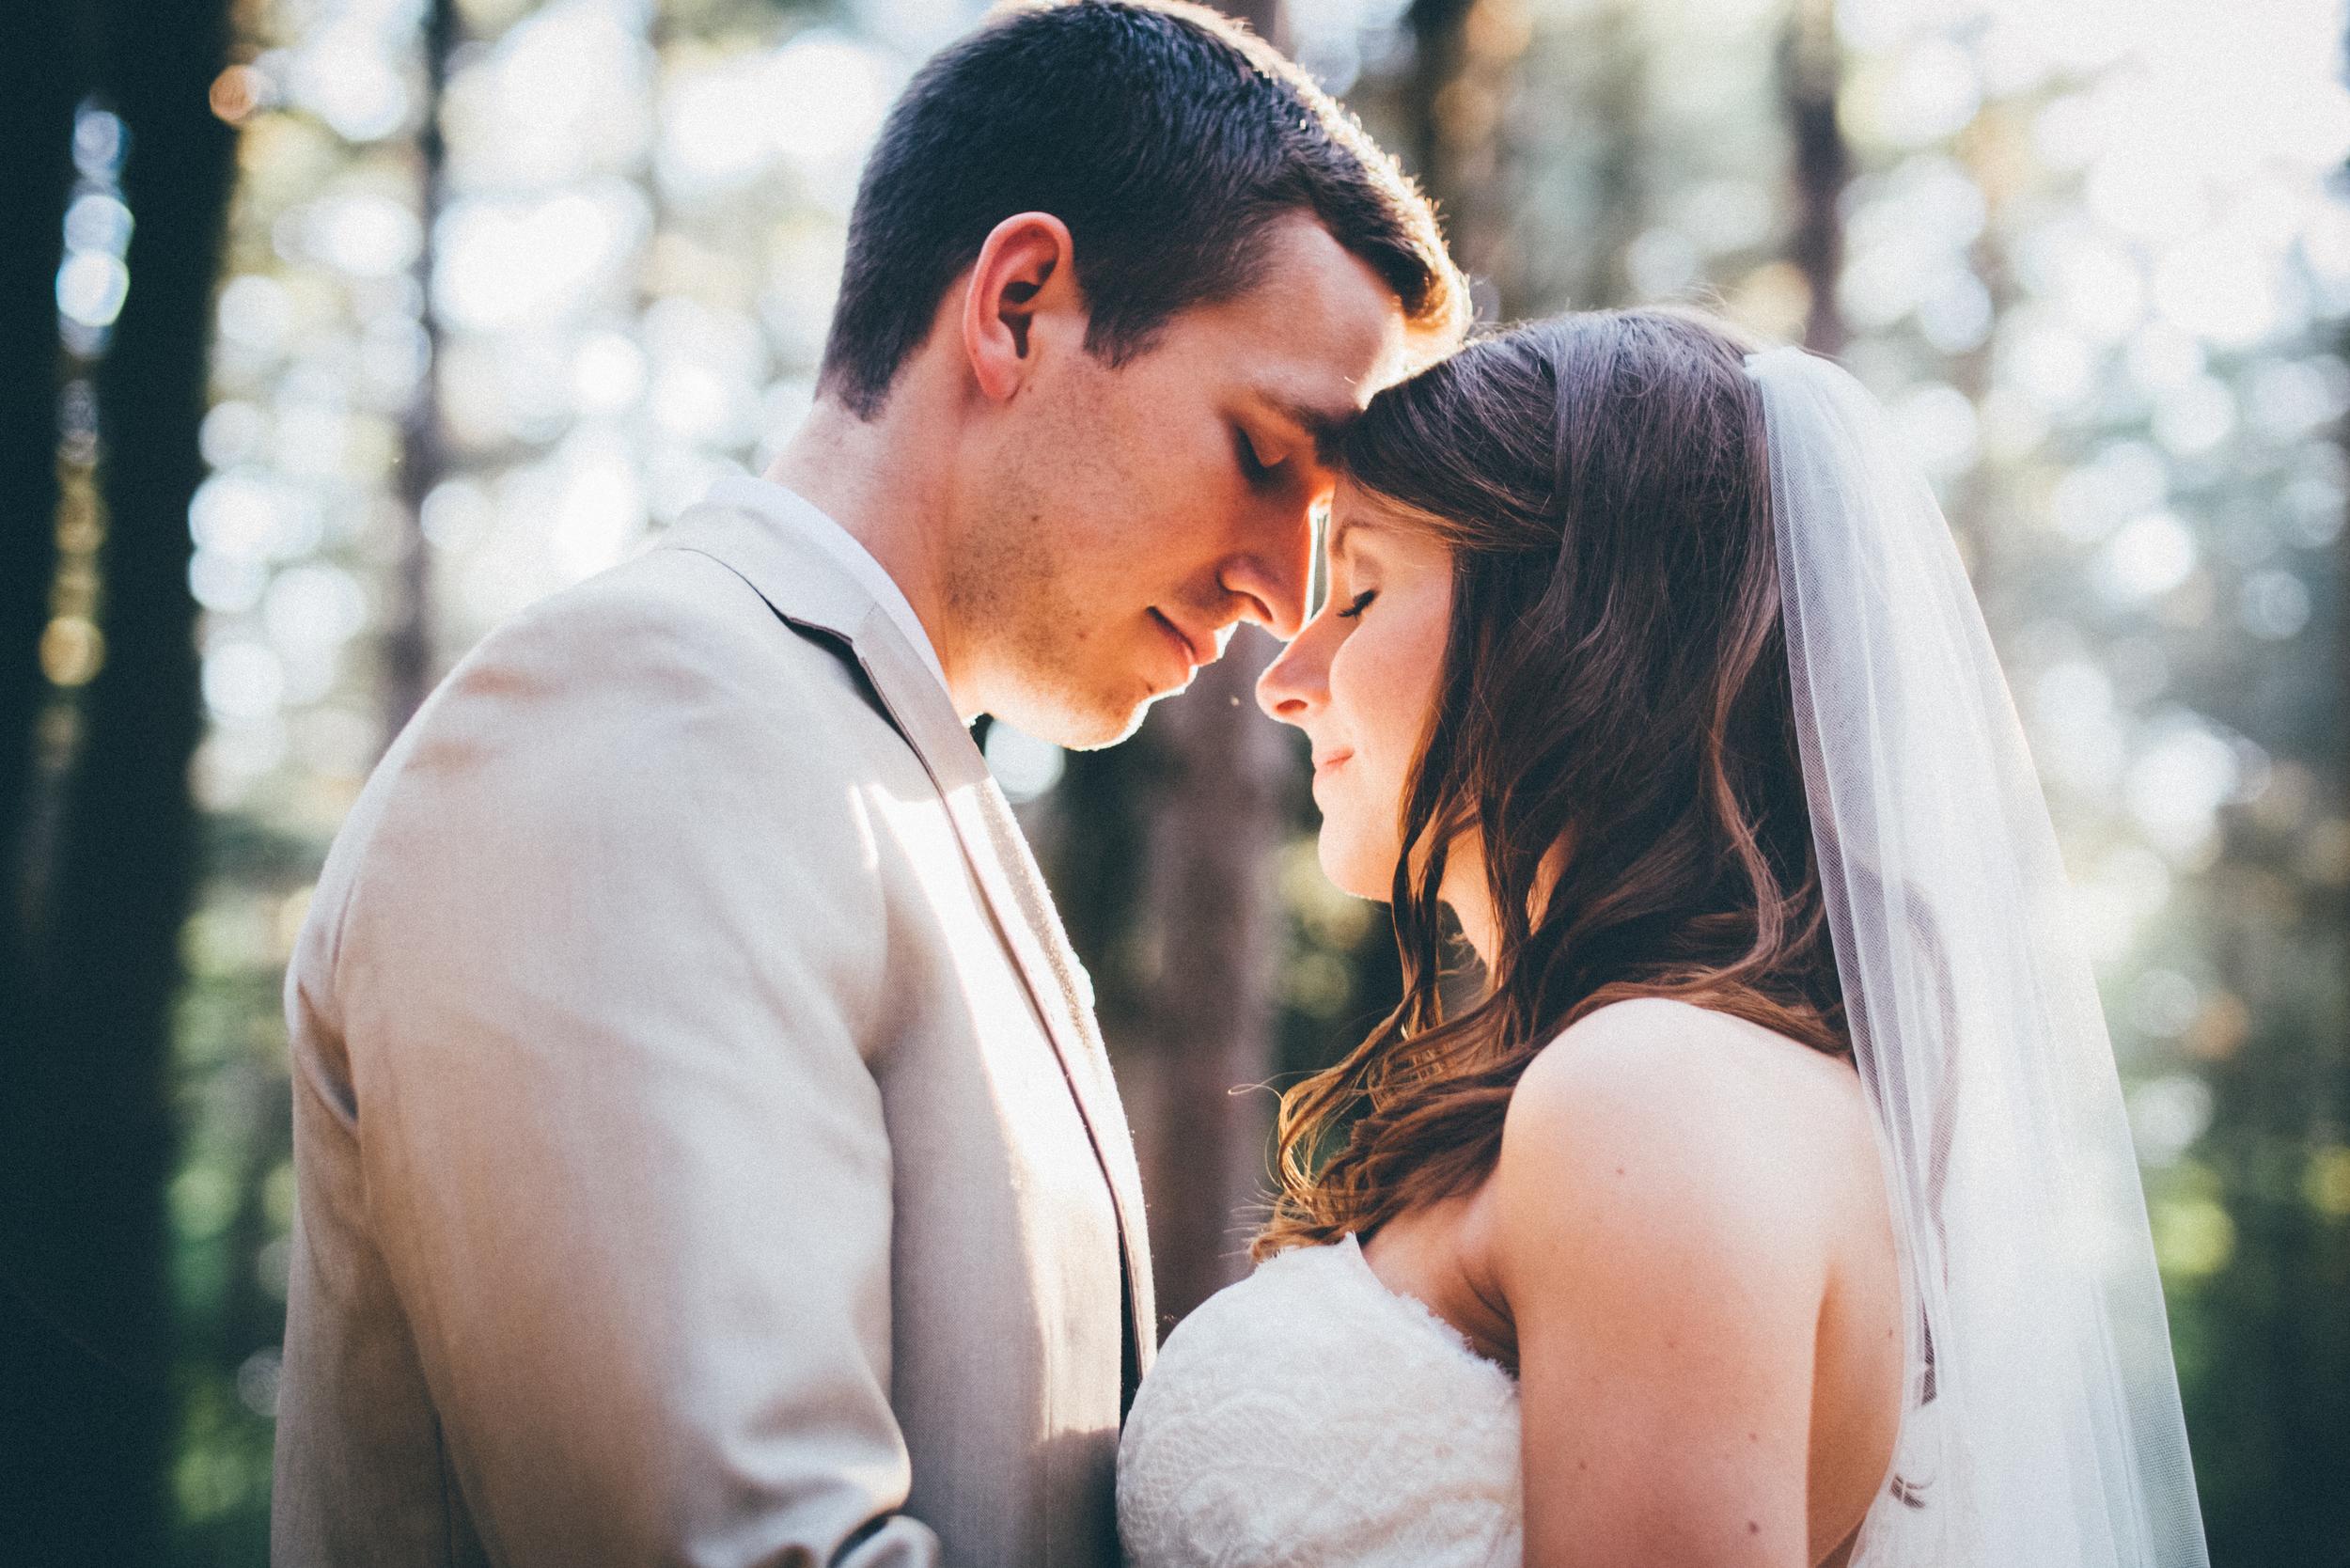 Grand-Rapids-Michigan-Wedding-Photography-Cinematography-Shadow-Shine-Pictures-Josh-Cassie-Teigen-Schoonmaker-010